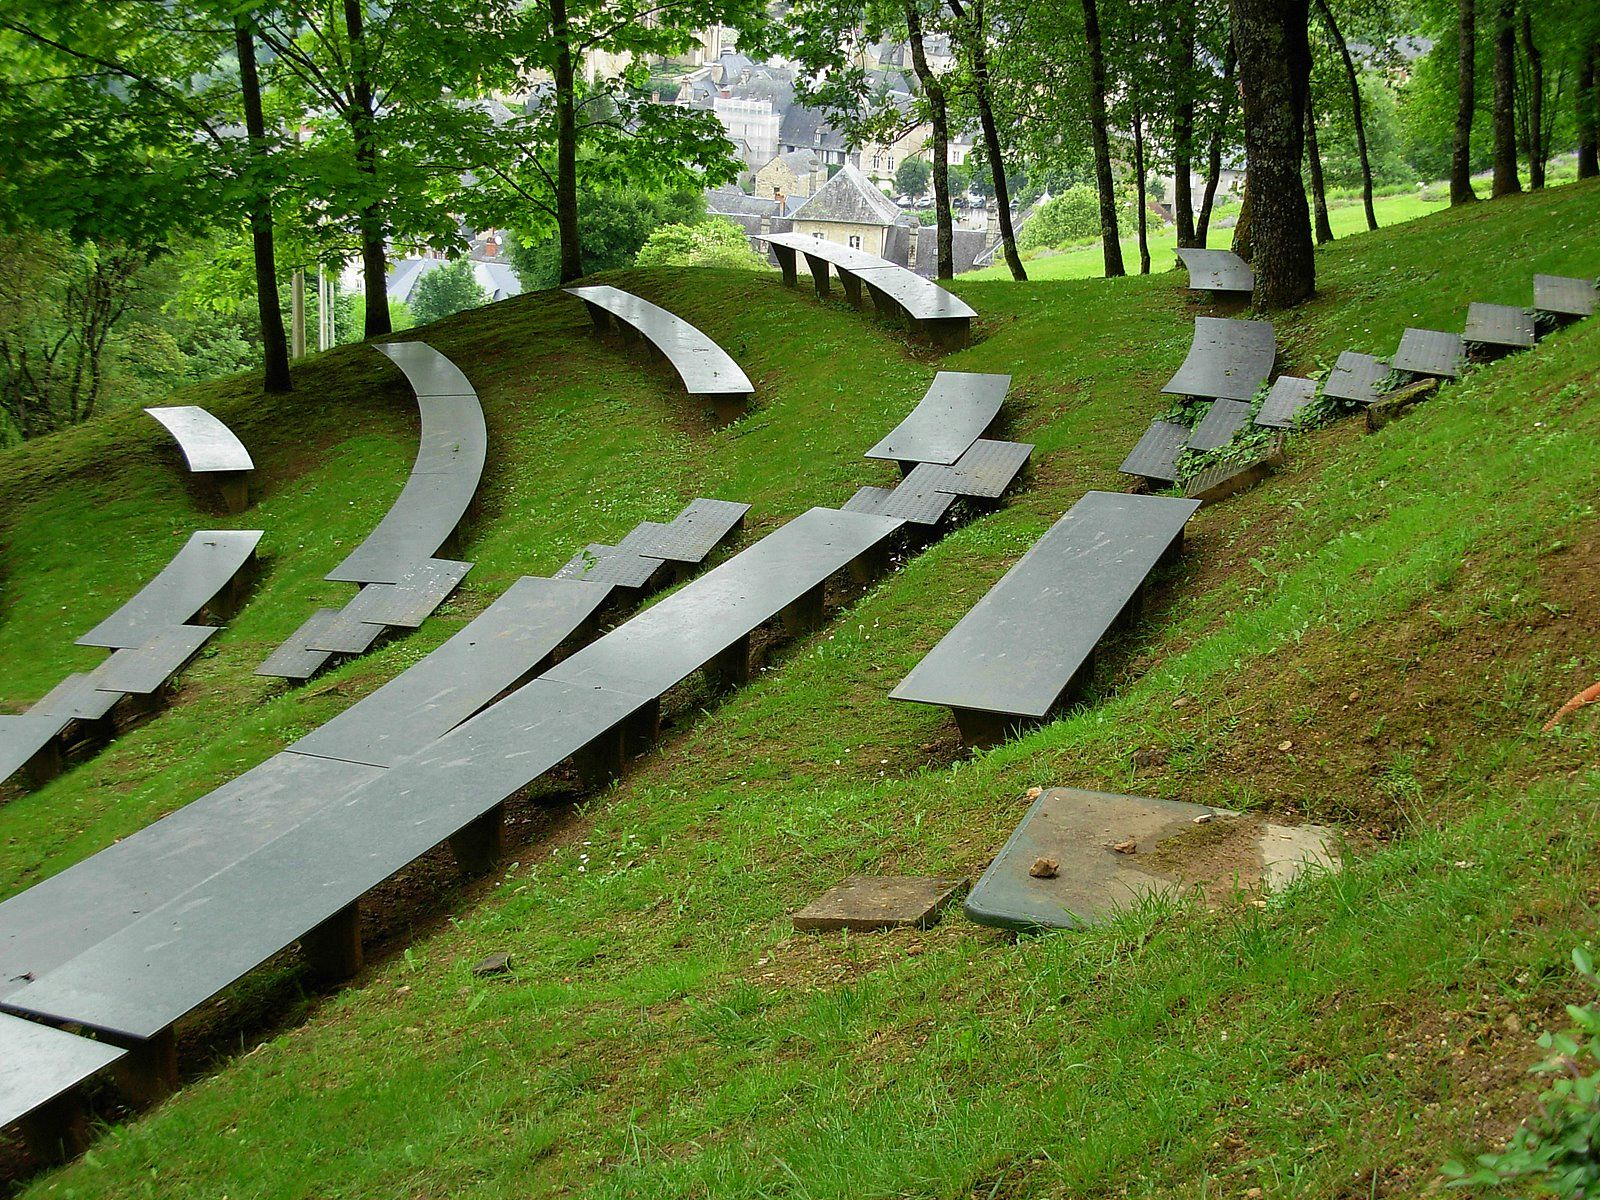 Jardin public contemporain recherche google l a n d for Jardin contemporain